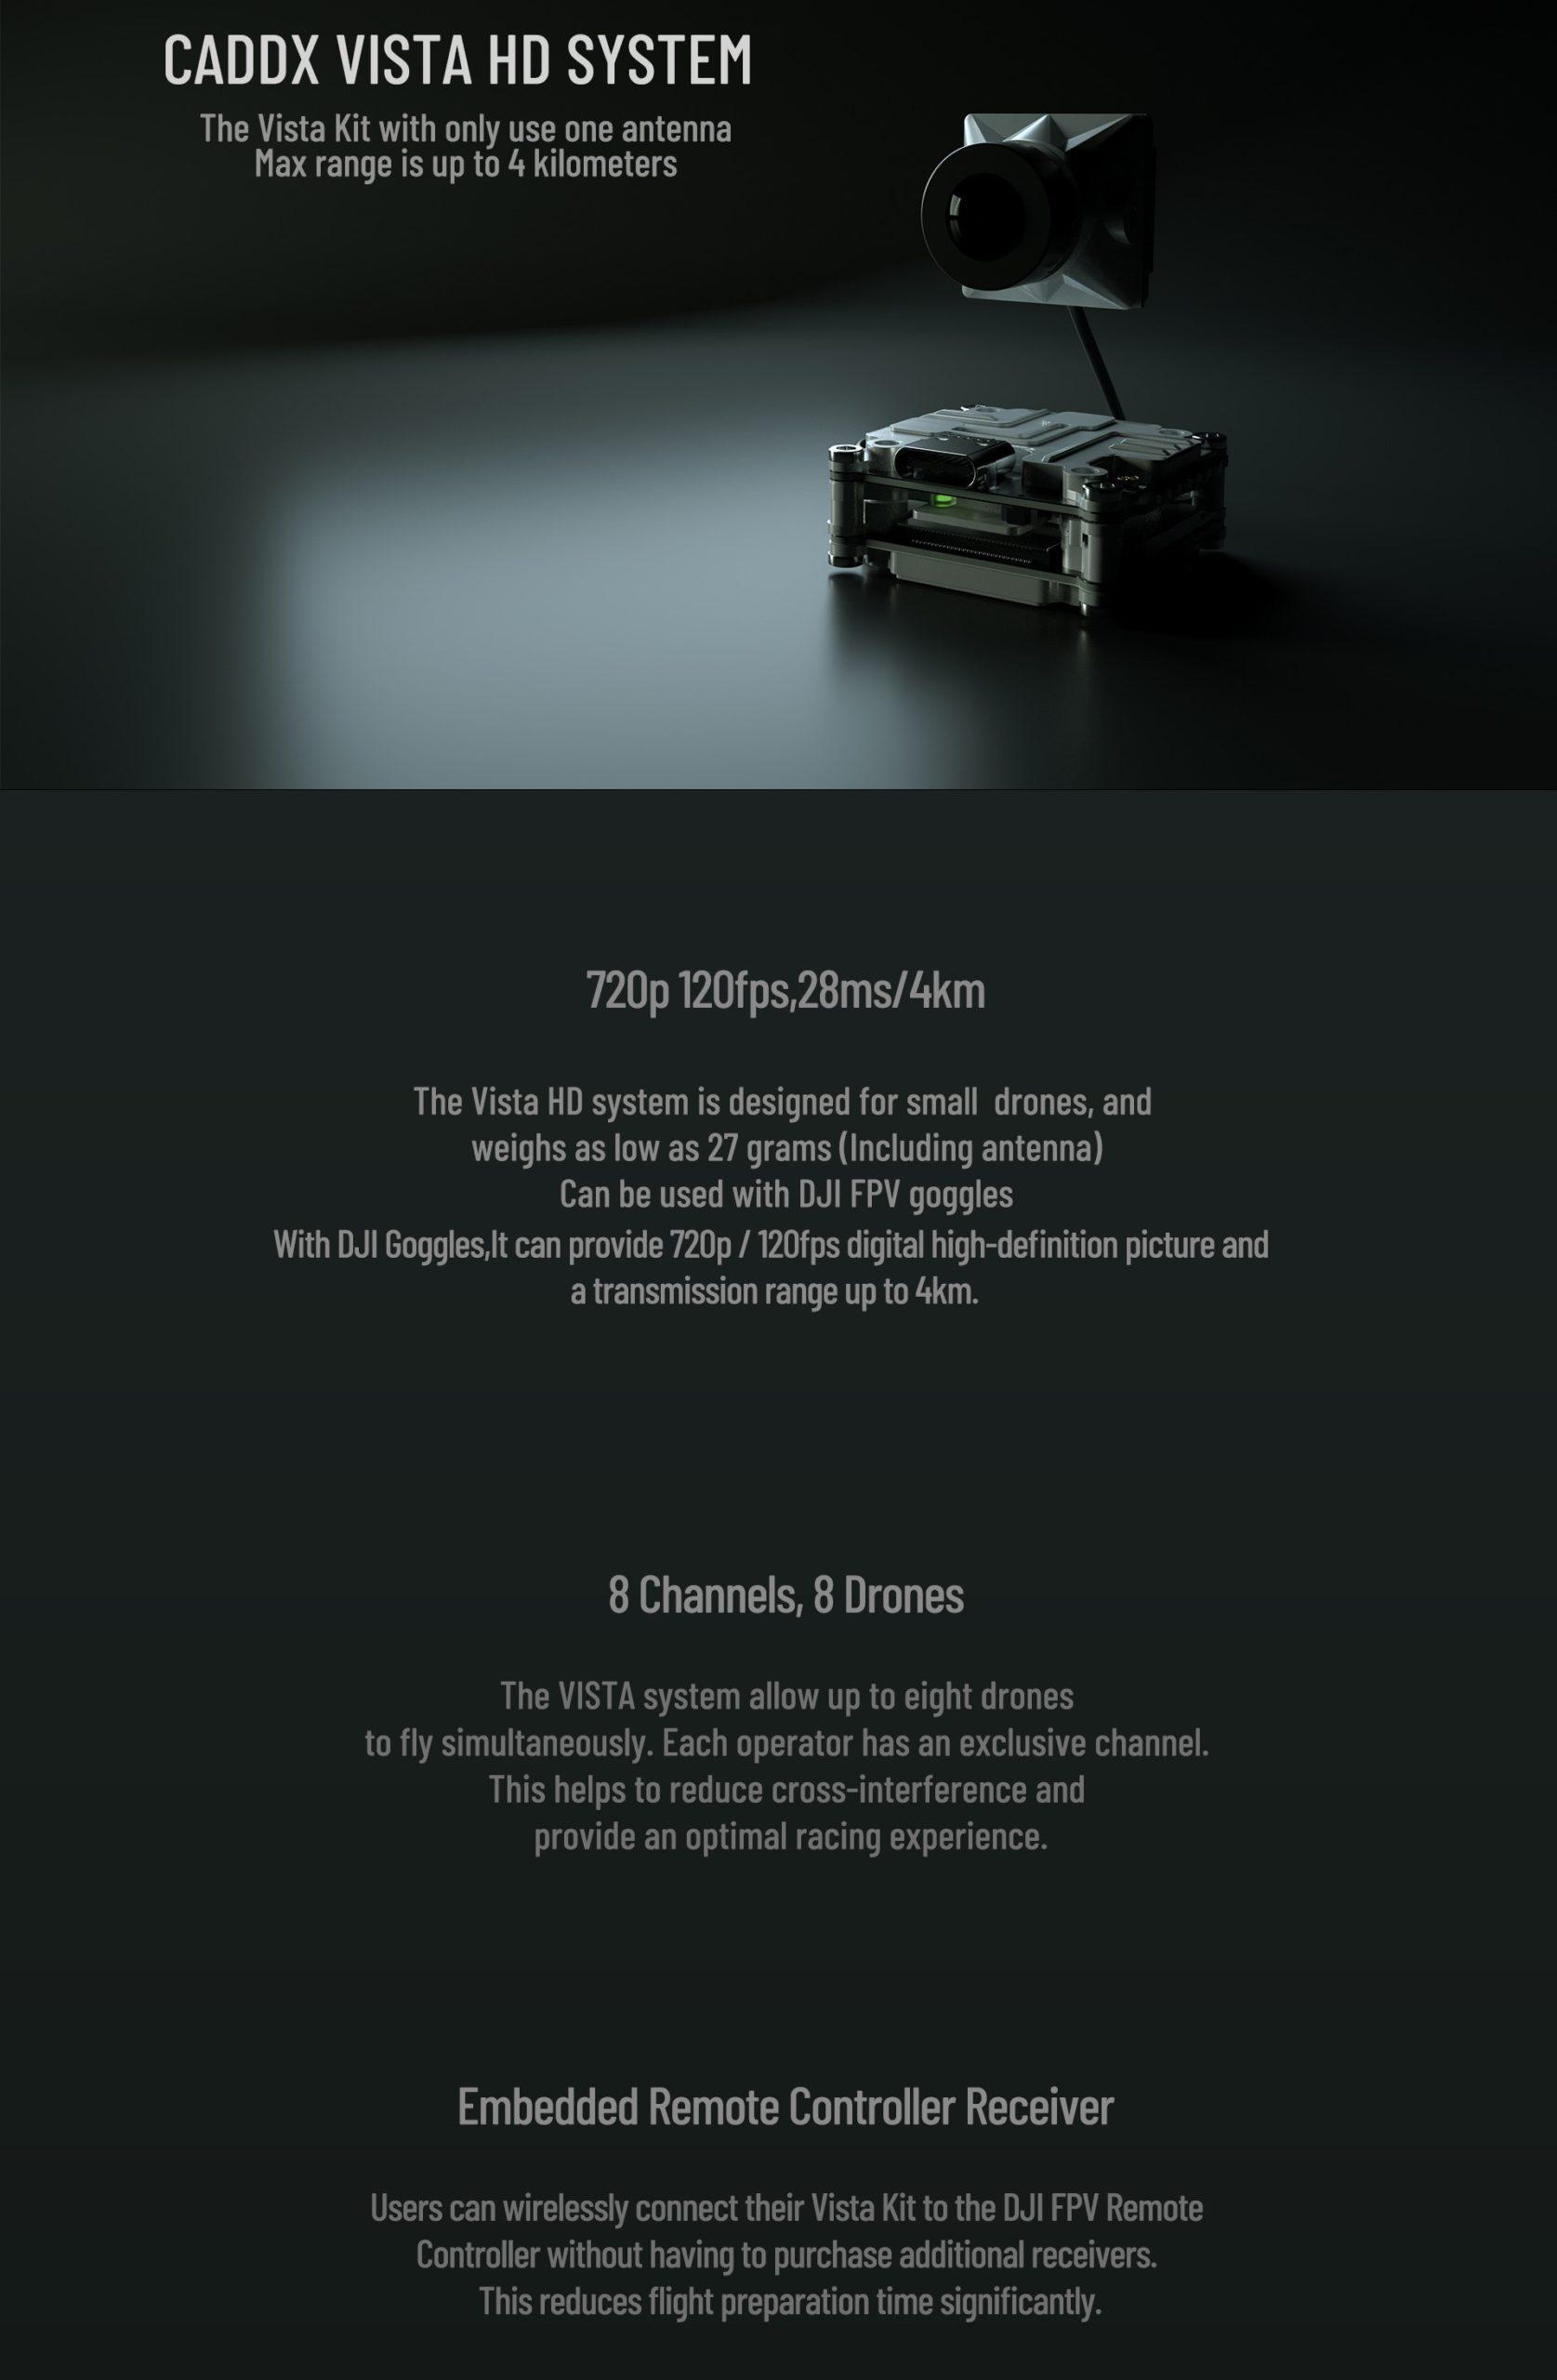 Caddx Nebula Pro Vista Kit HD Digital FPV System